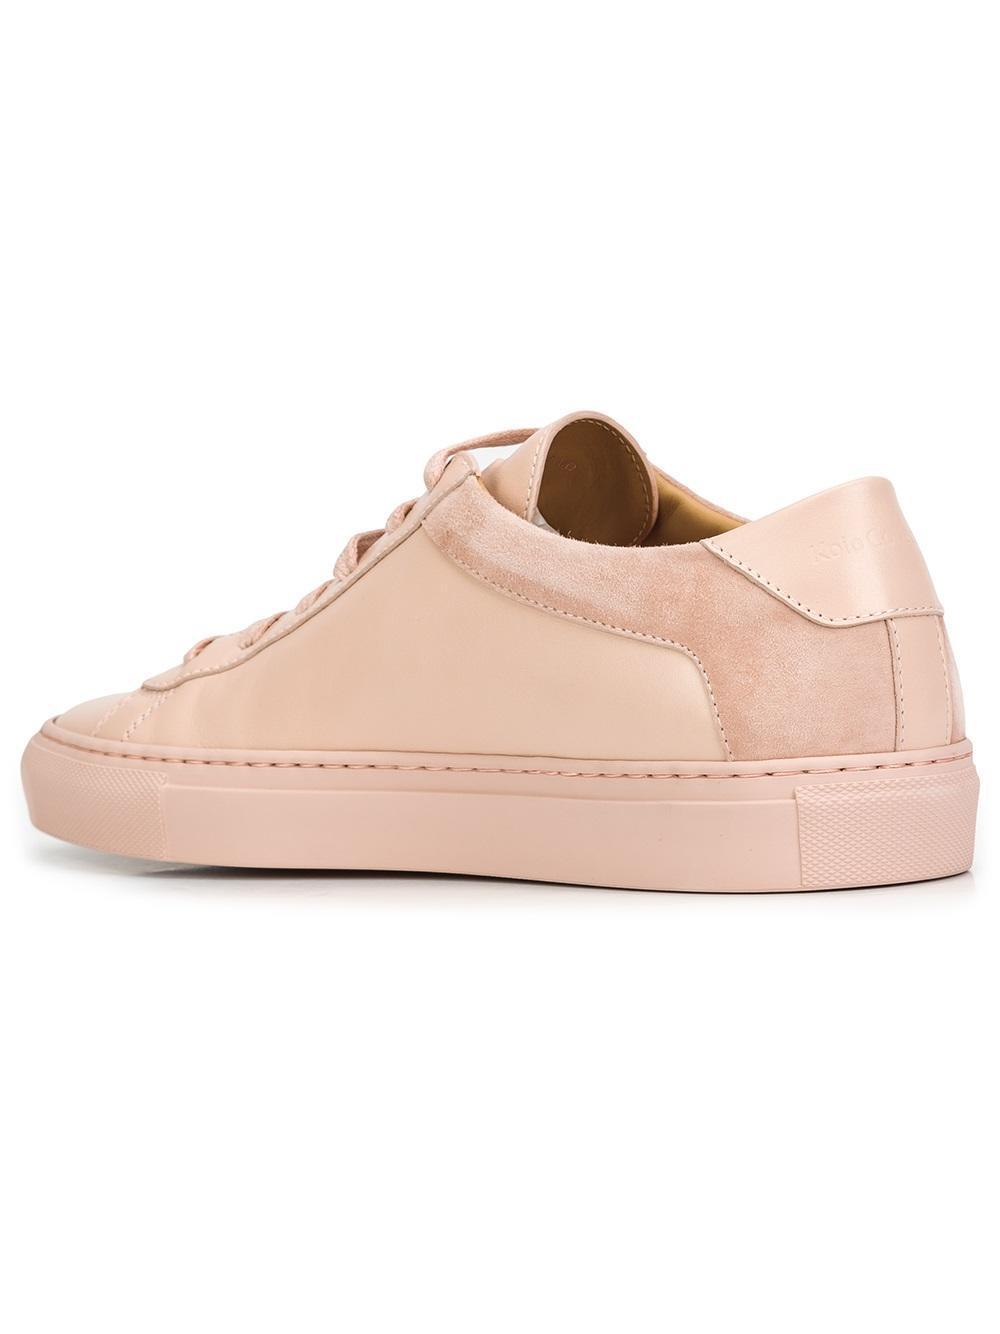 Lyst Sneakers In Fiore' 'capri Pink Koio TqrHvwTRB